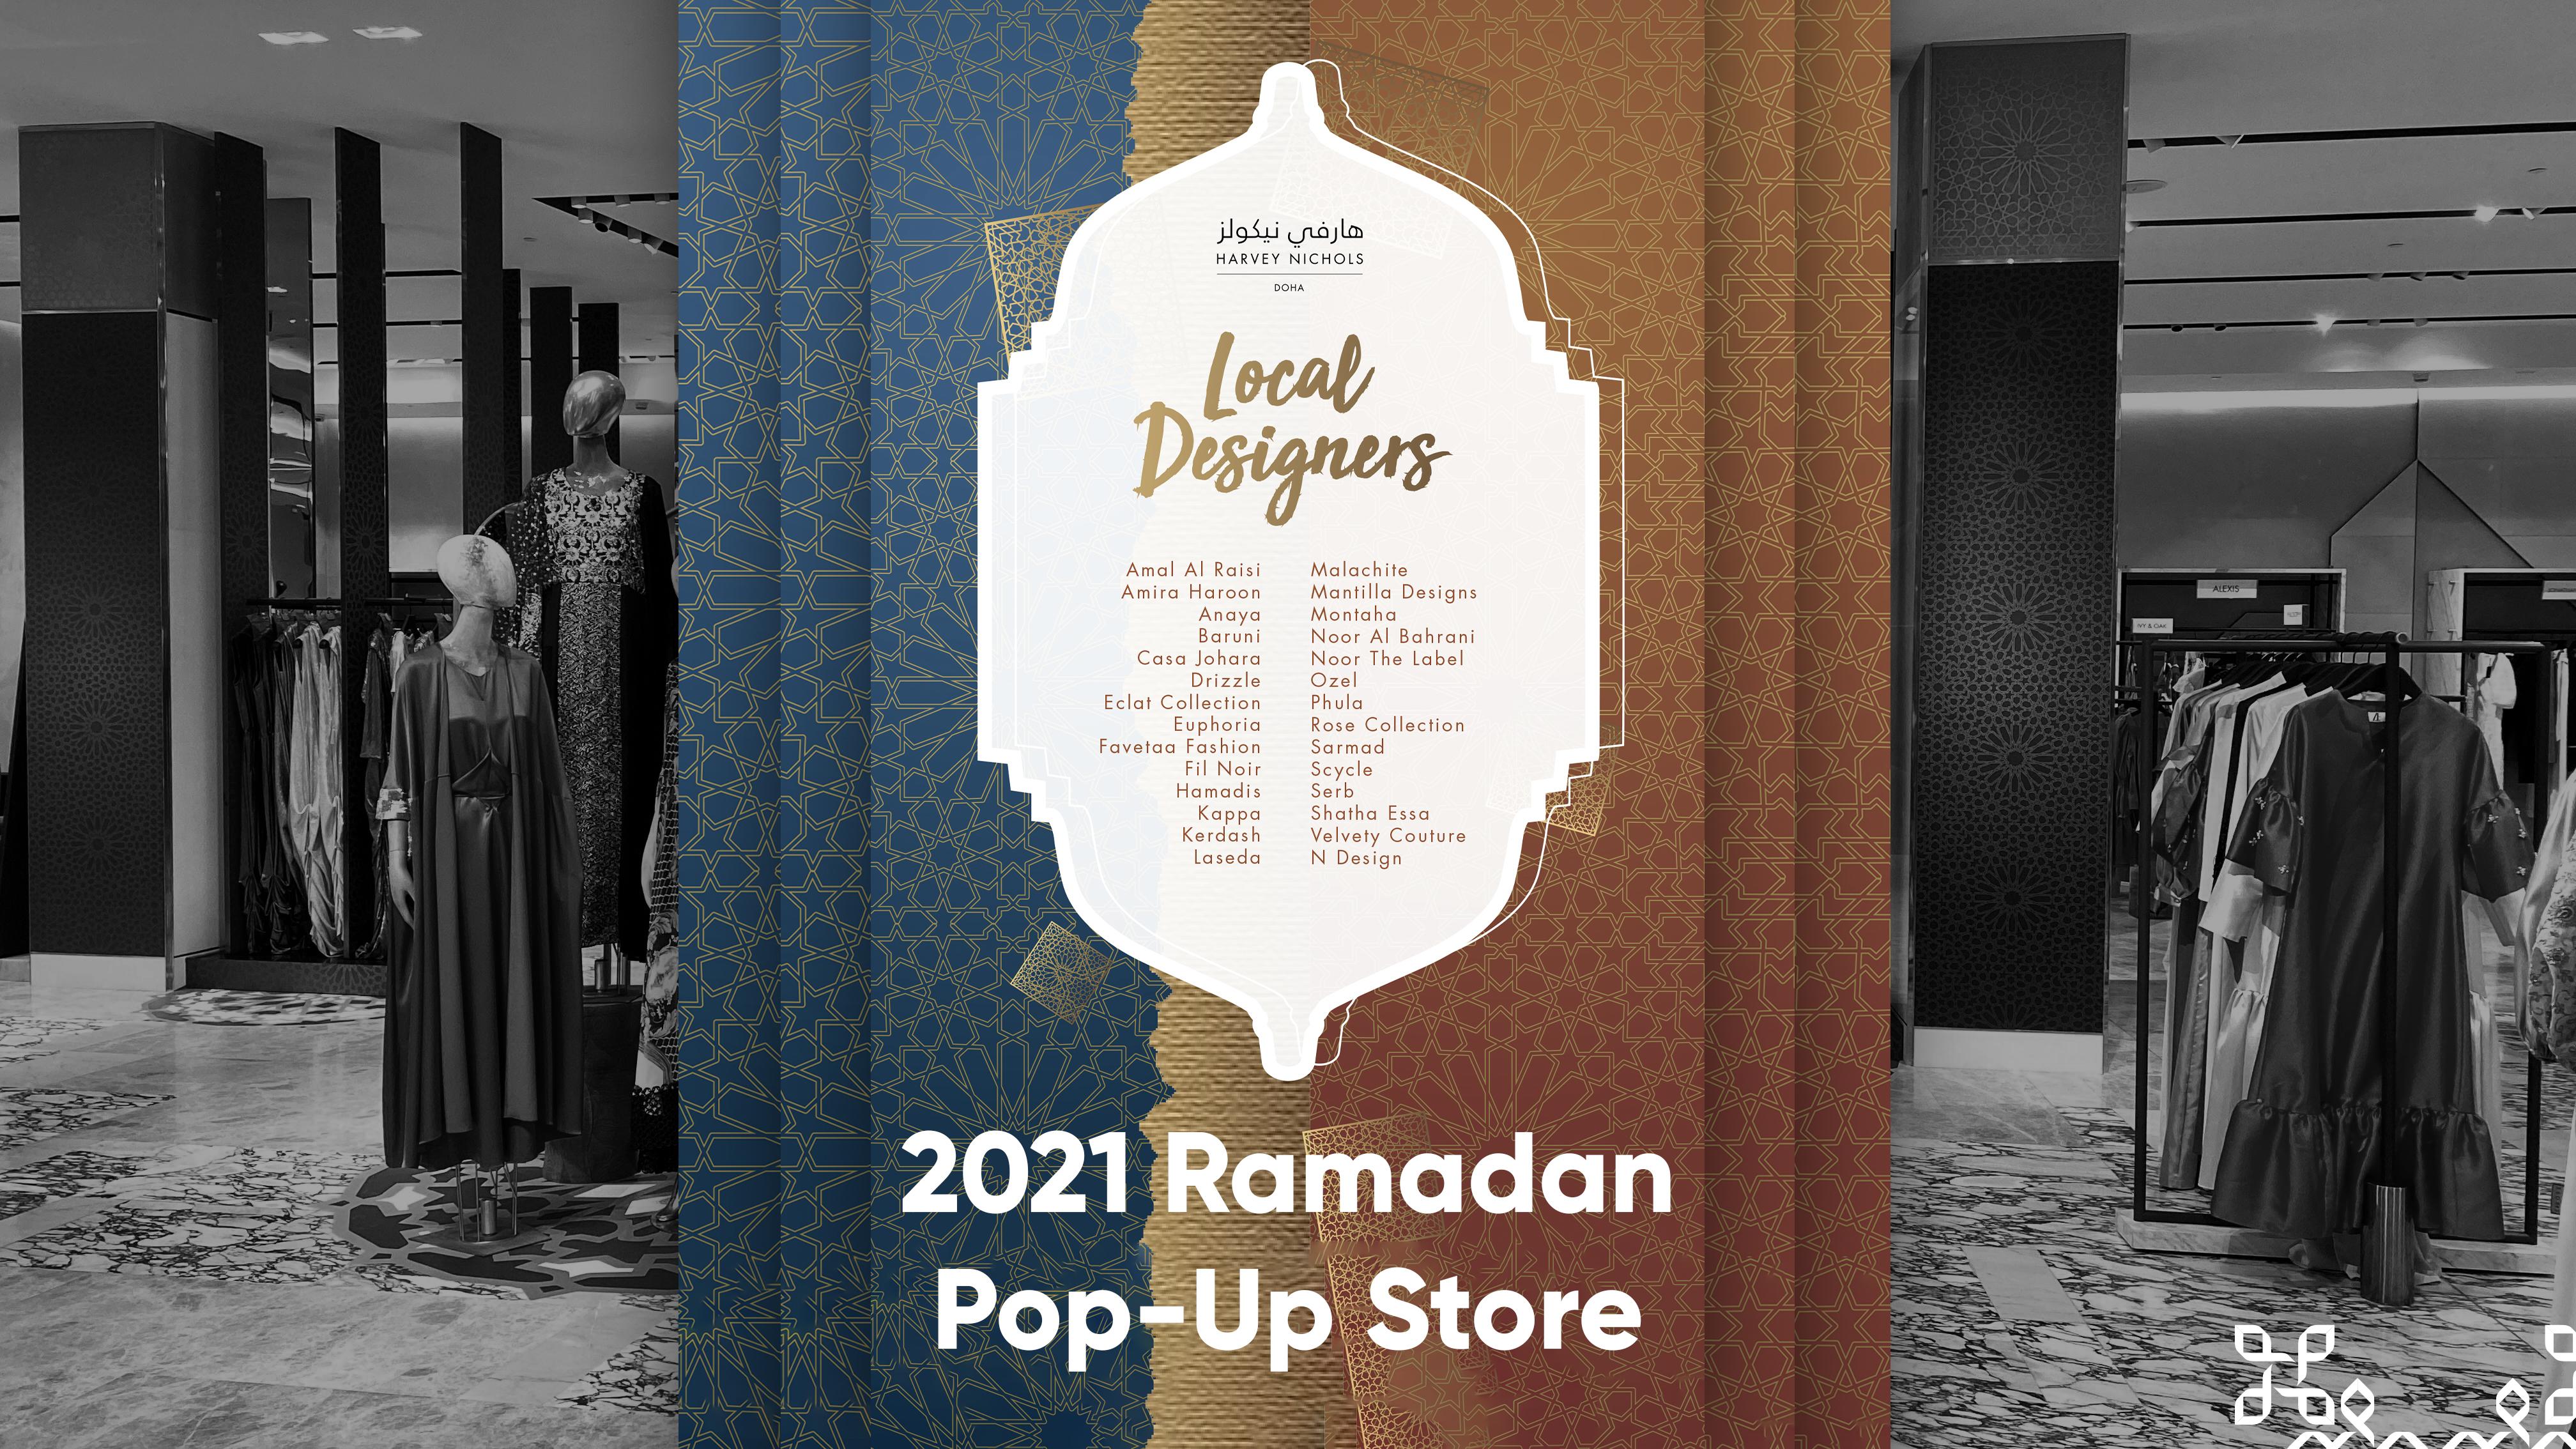 Harvey Nichols, Doha: Ramadan Pop Up Store